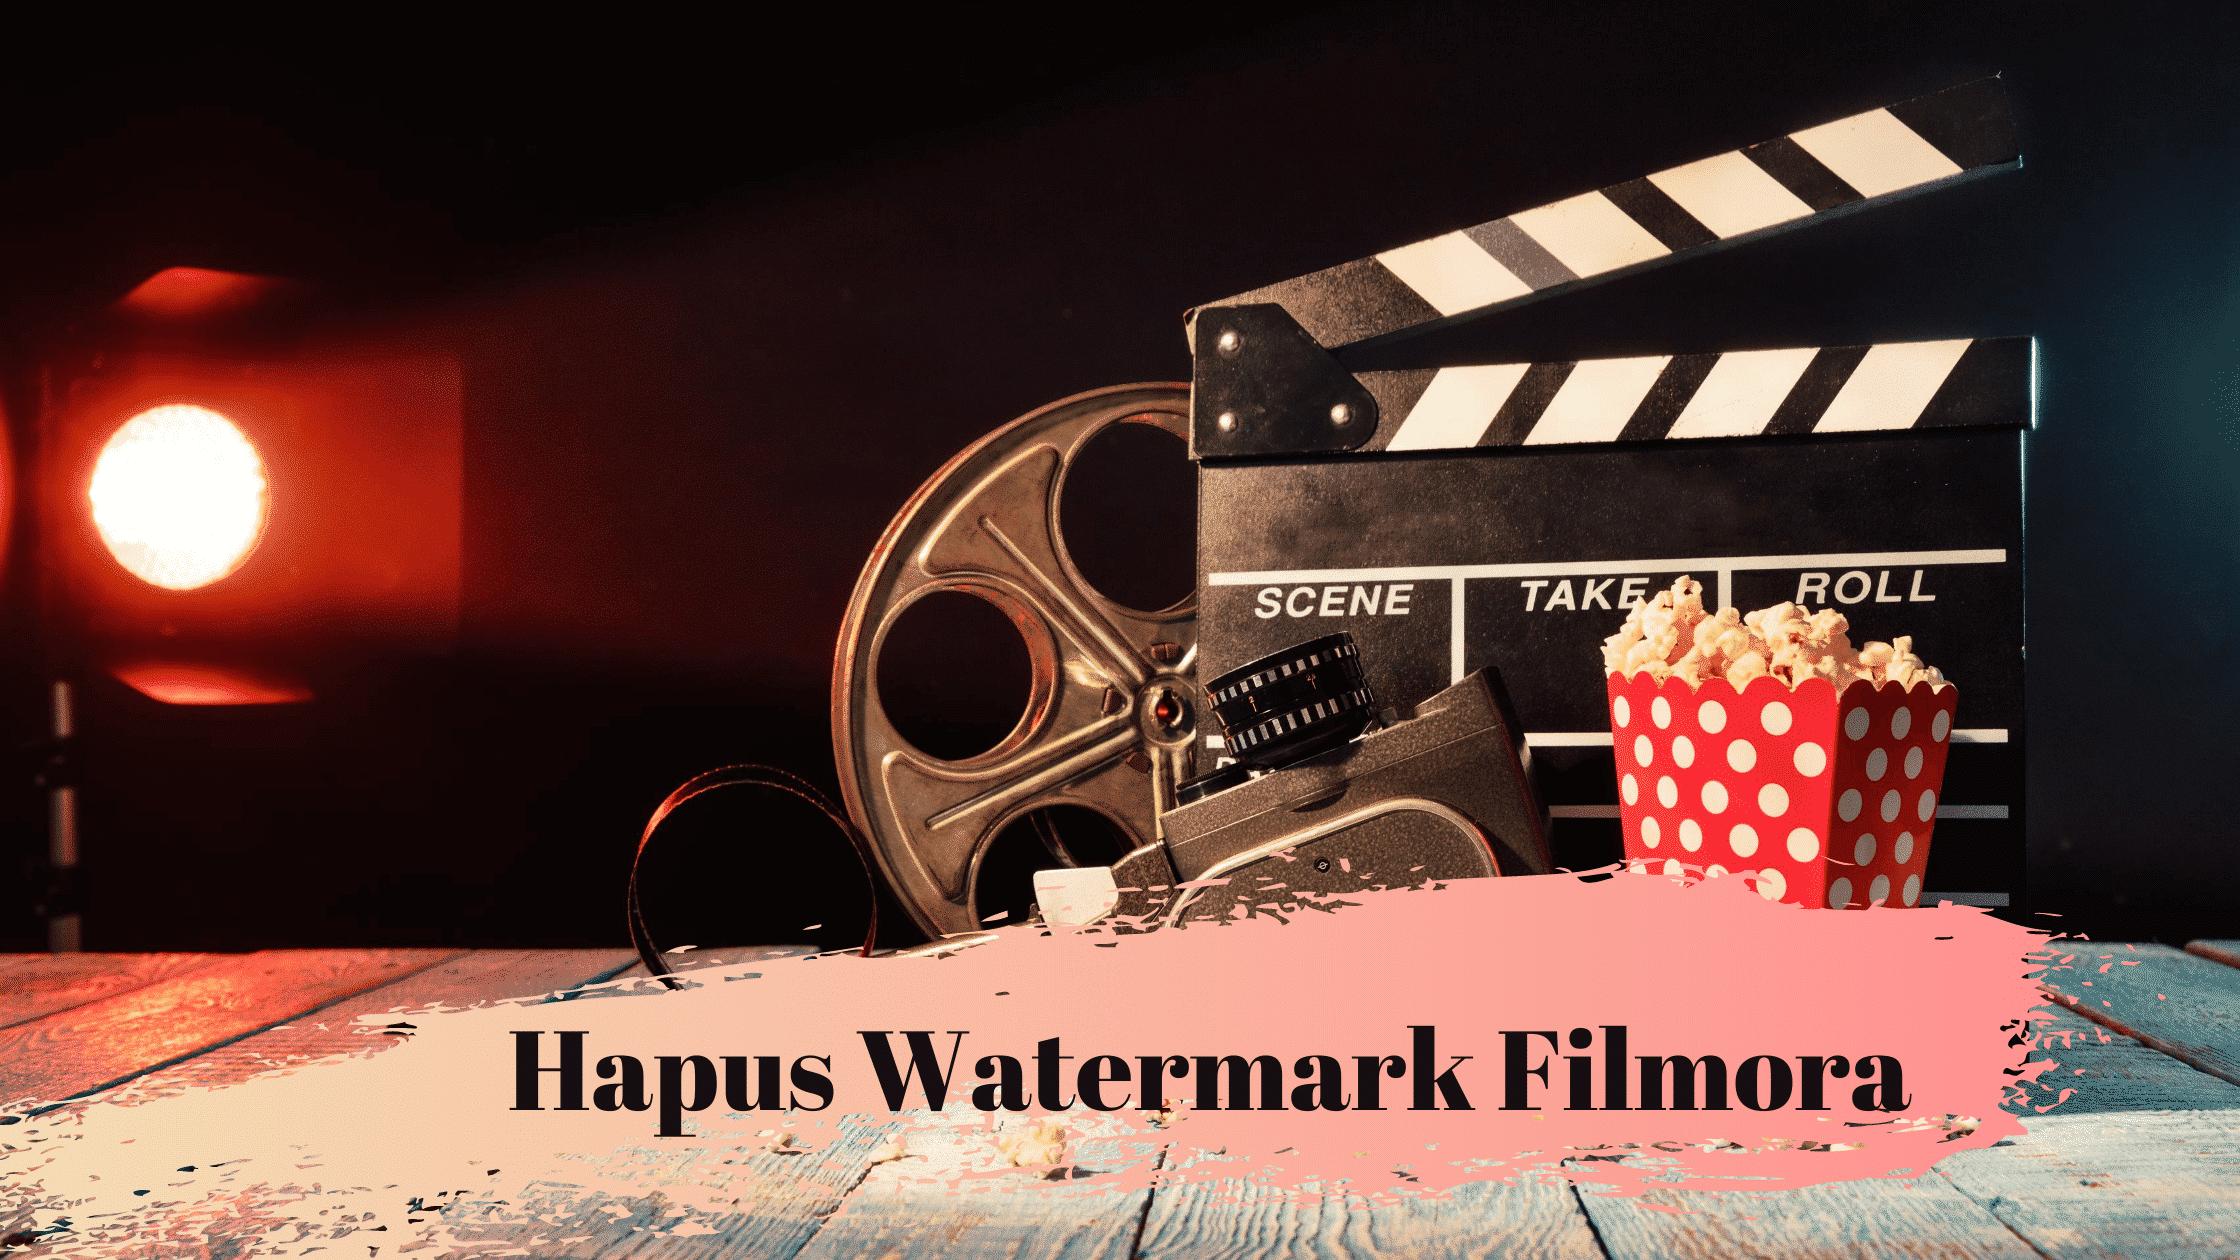 Hapus Watermark Filmora